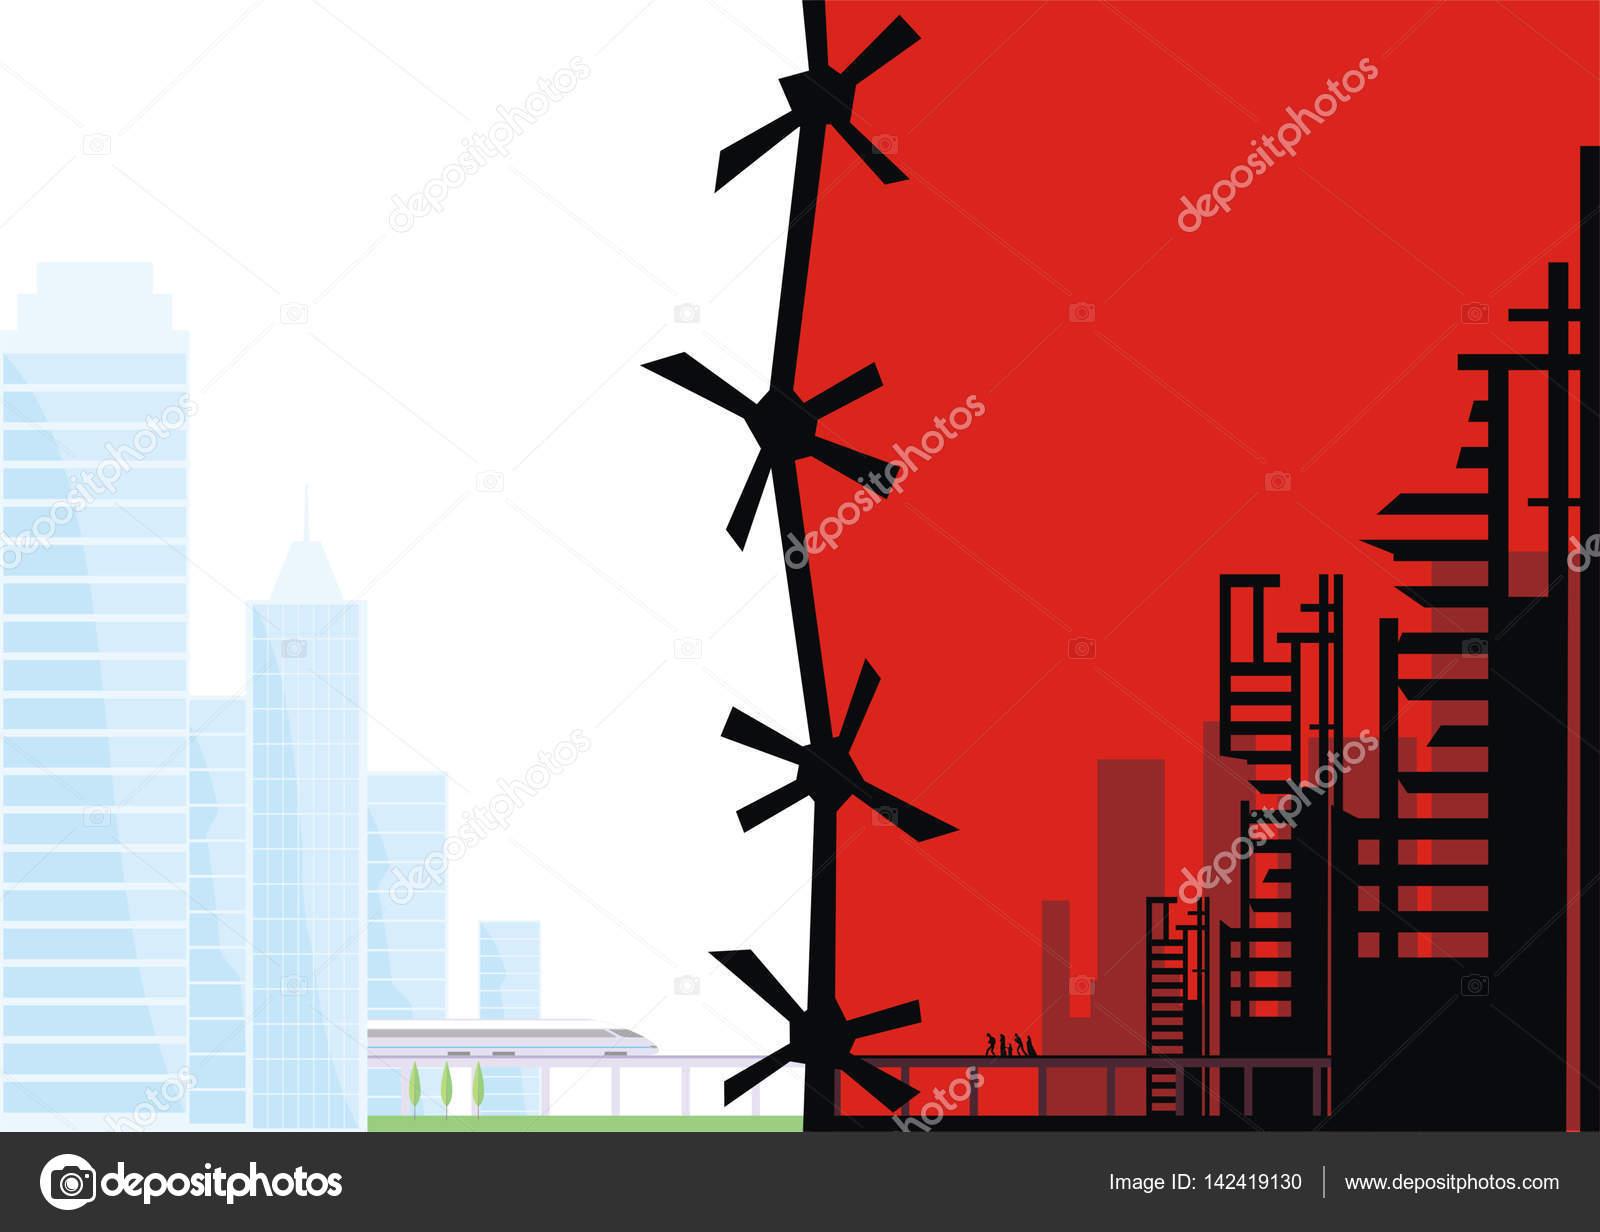 poster template about migrants stock vector belova8516 yandex ru